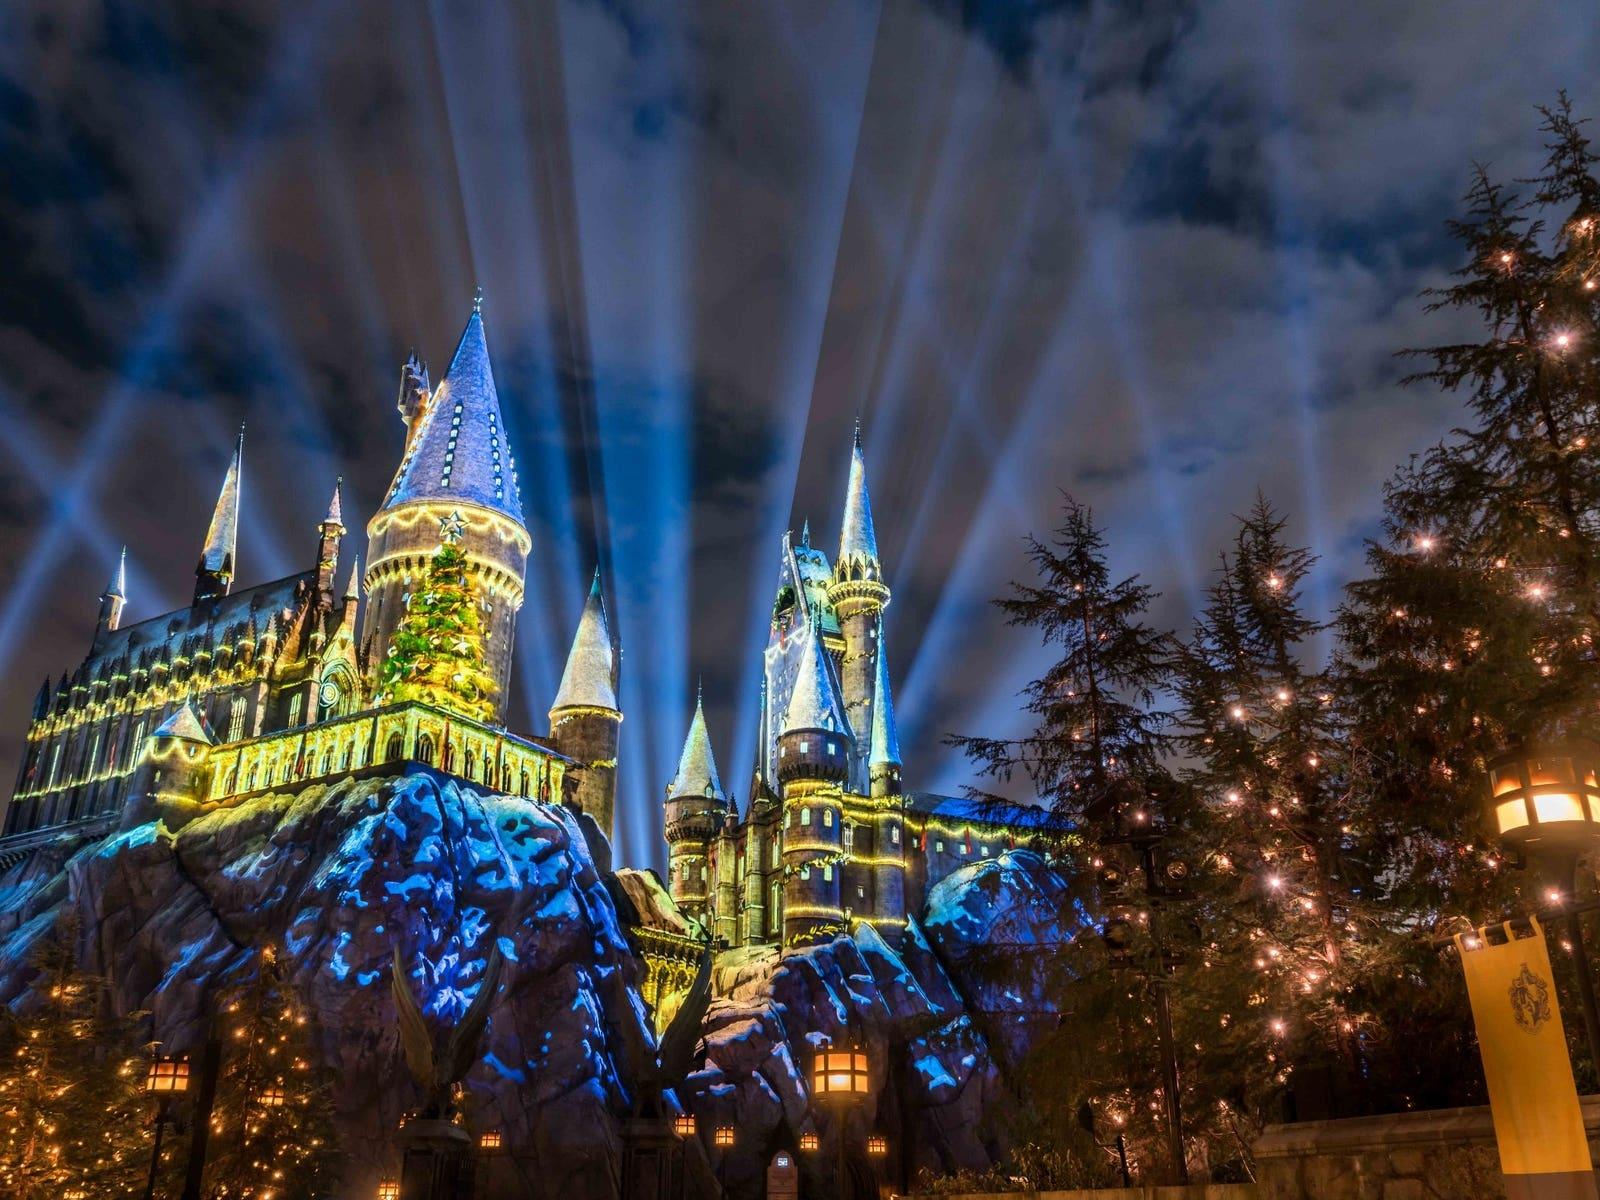 Universal Studios Hollywood The Magic of Christmas at Hogwarts Castle